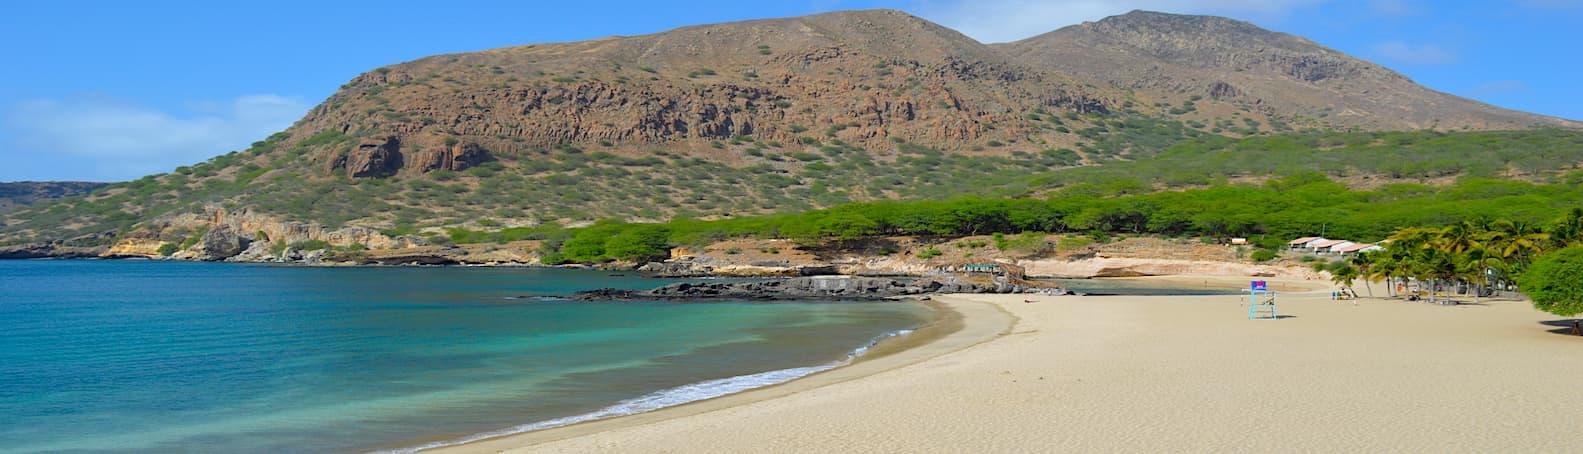 Cape Verde Santiago Tarrafal